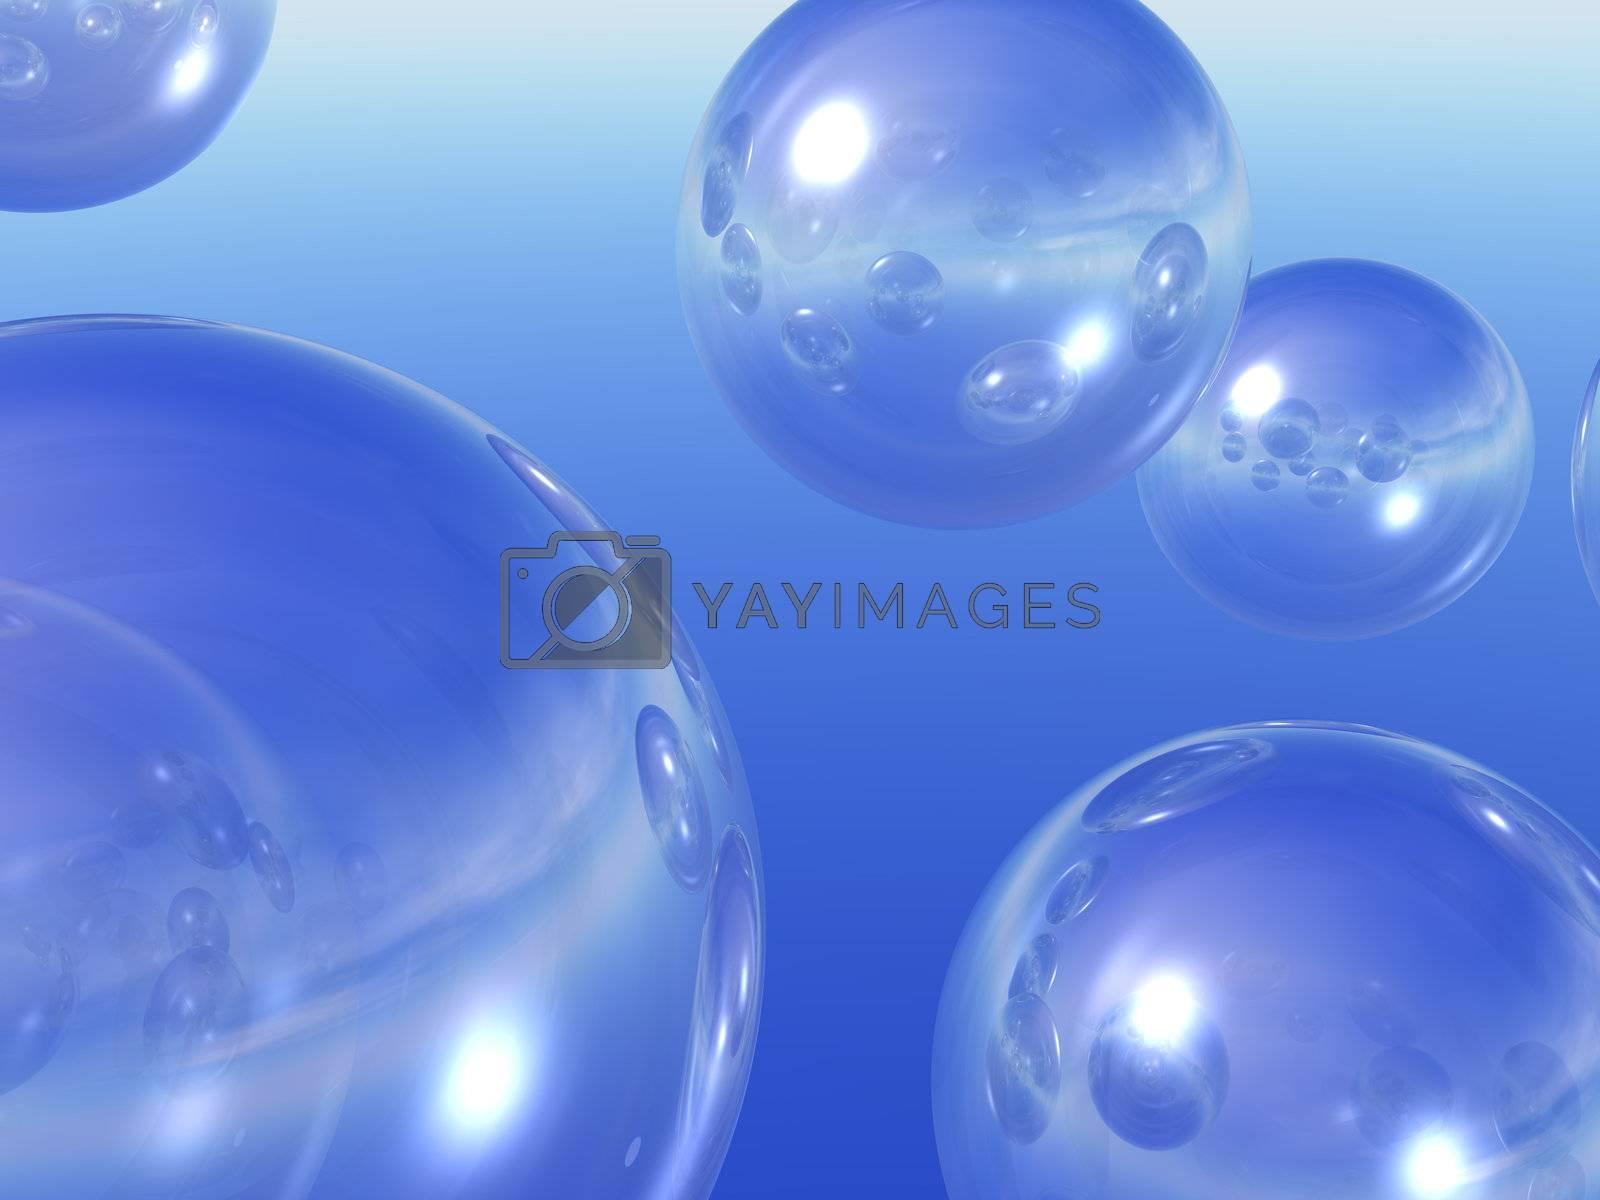 transparent balls in the sky - 3d illustration